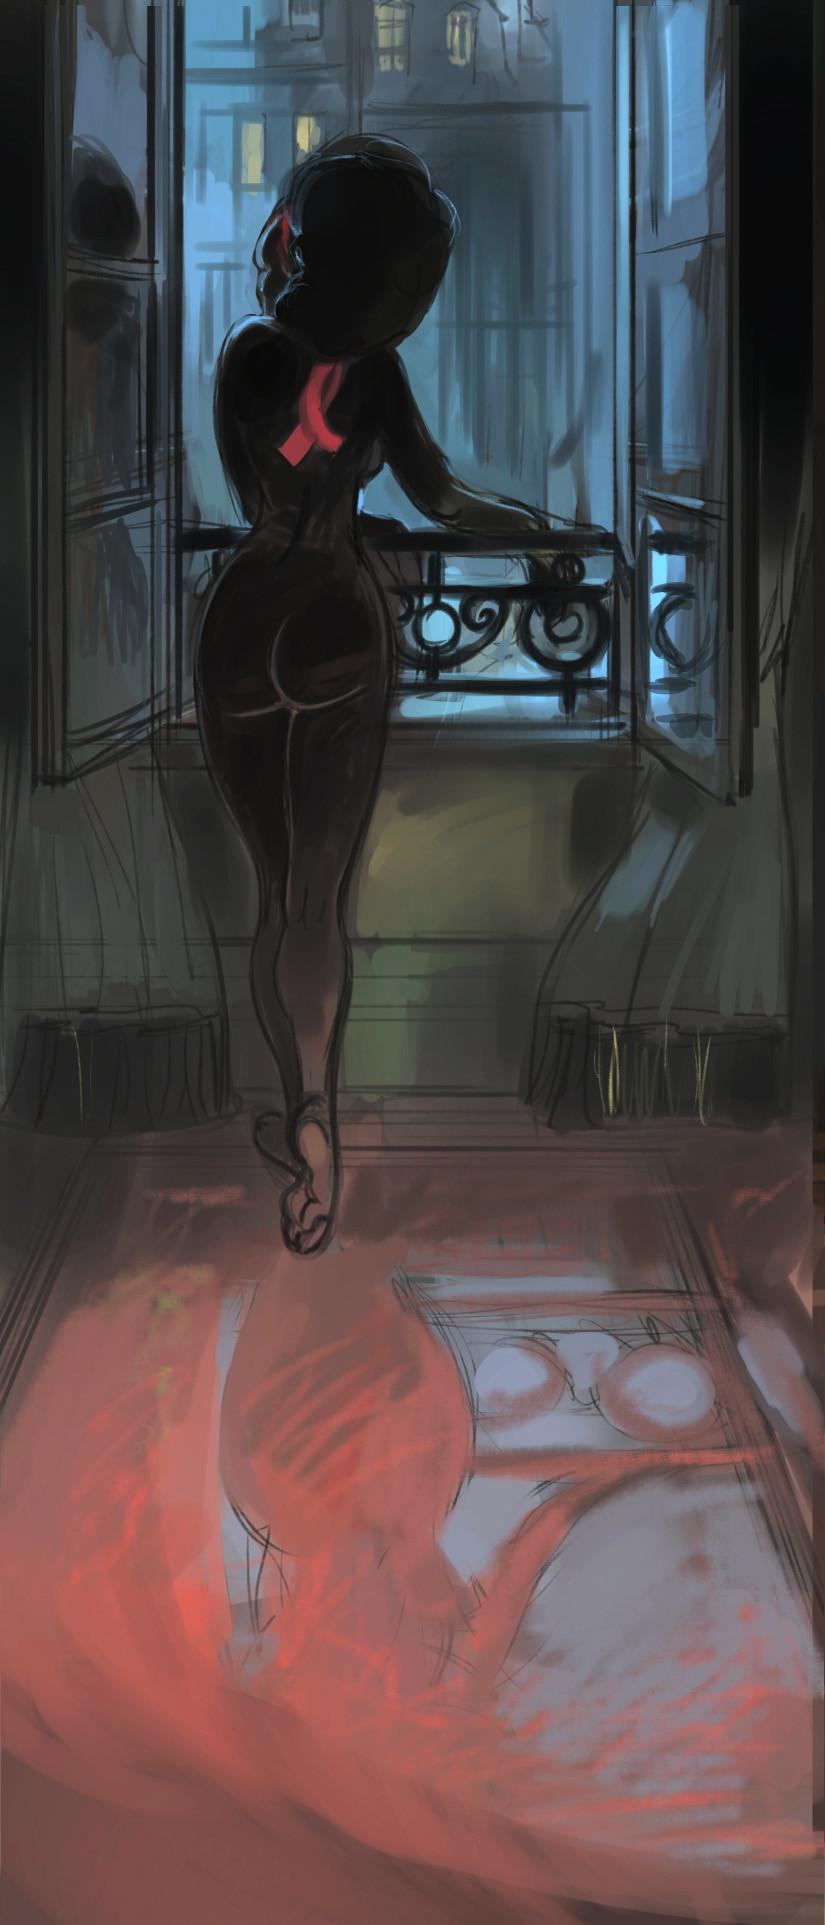 Yannick corboz am4 illustration10 r